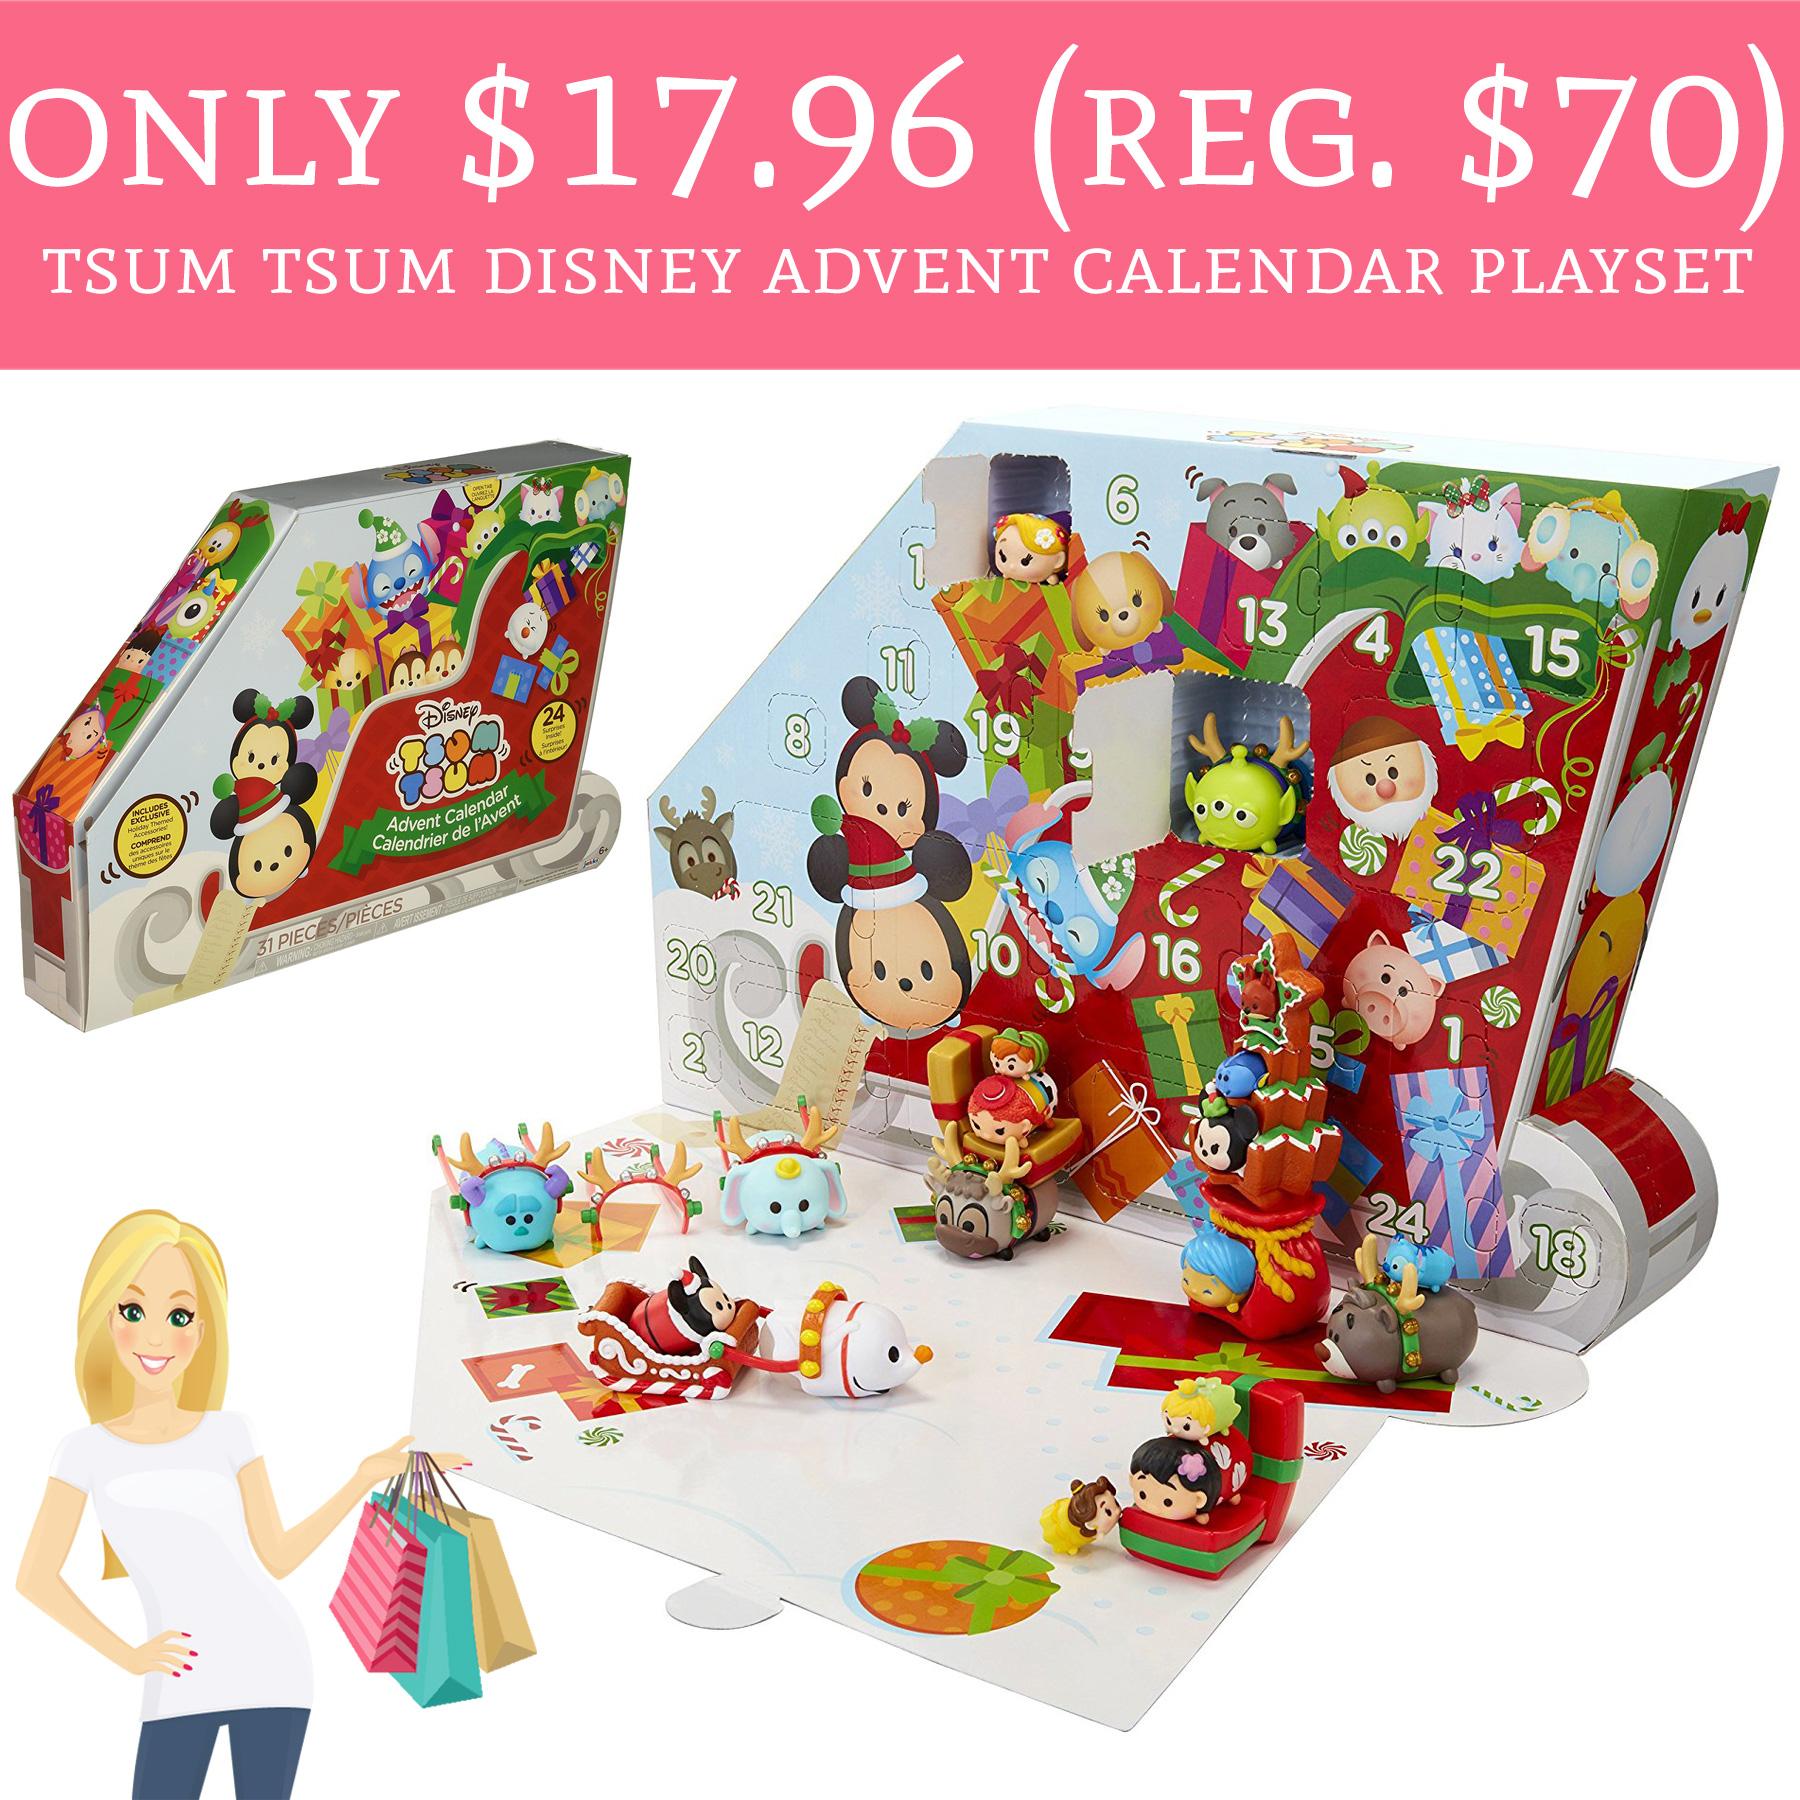 only 17 96 regular 70 tsum tsum disney advent calendar playset deal hunting babe